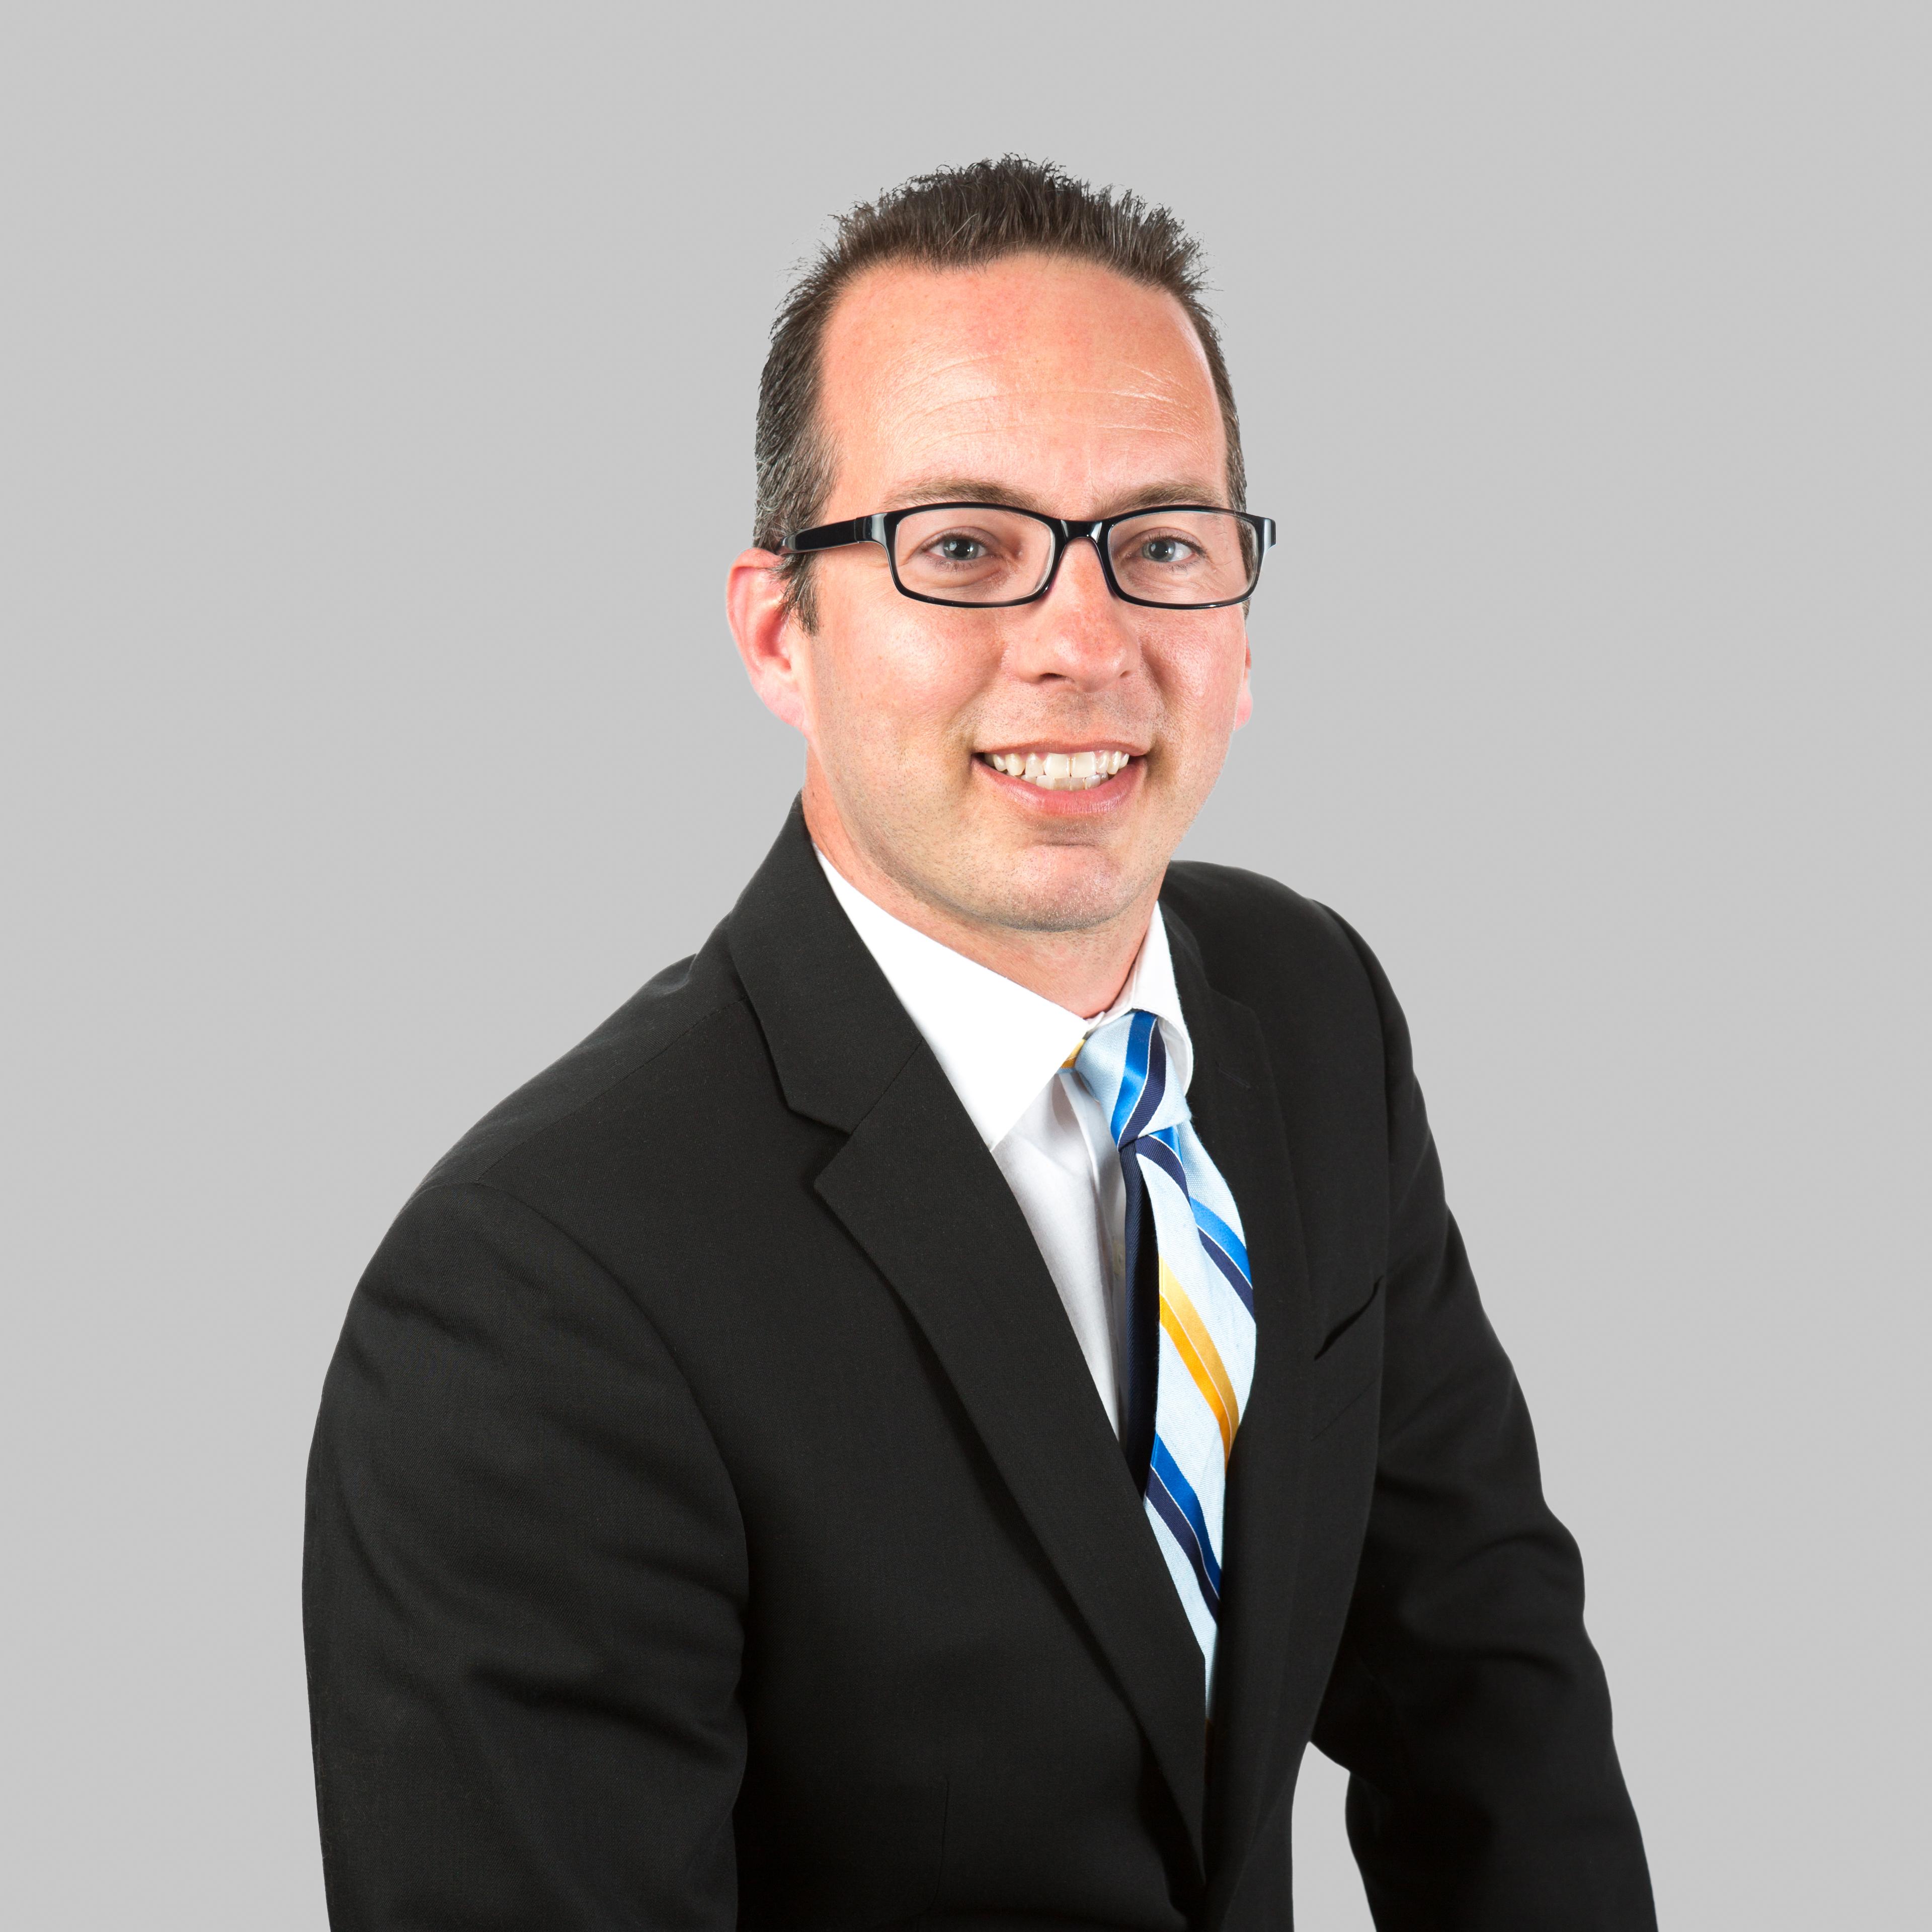 Chris Vignone, CEO